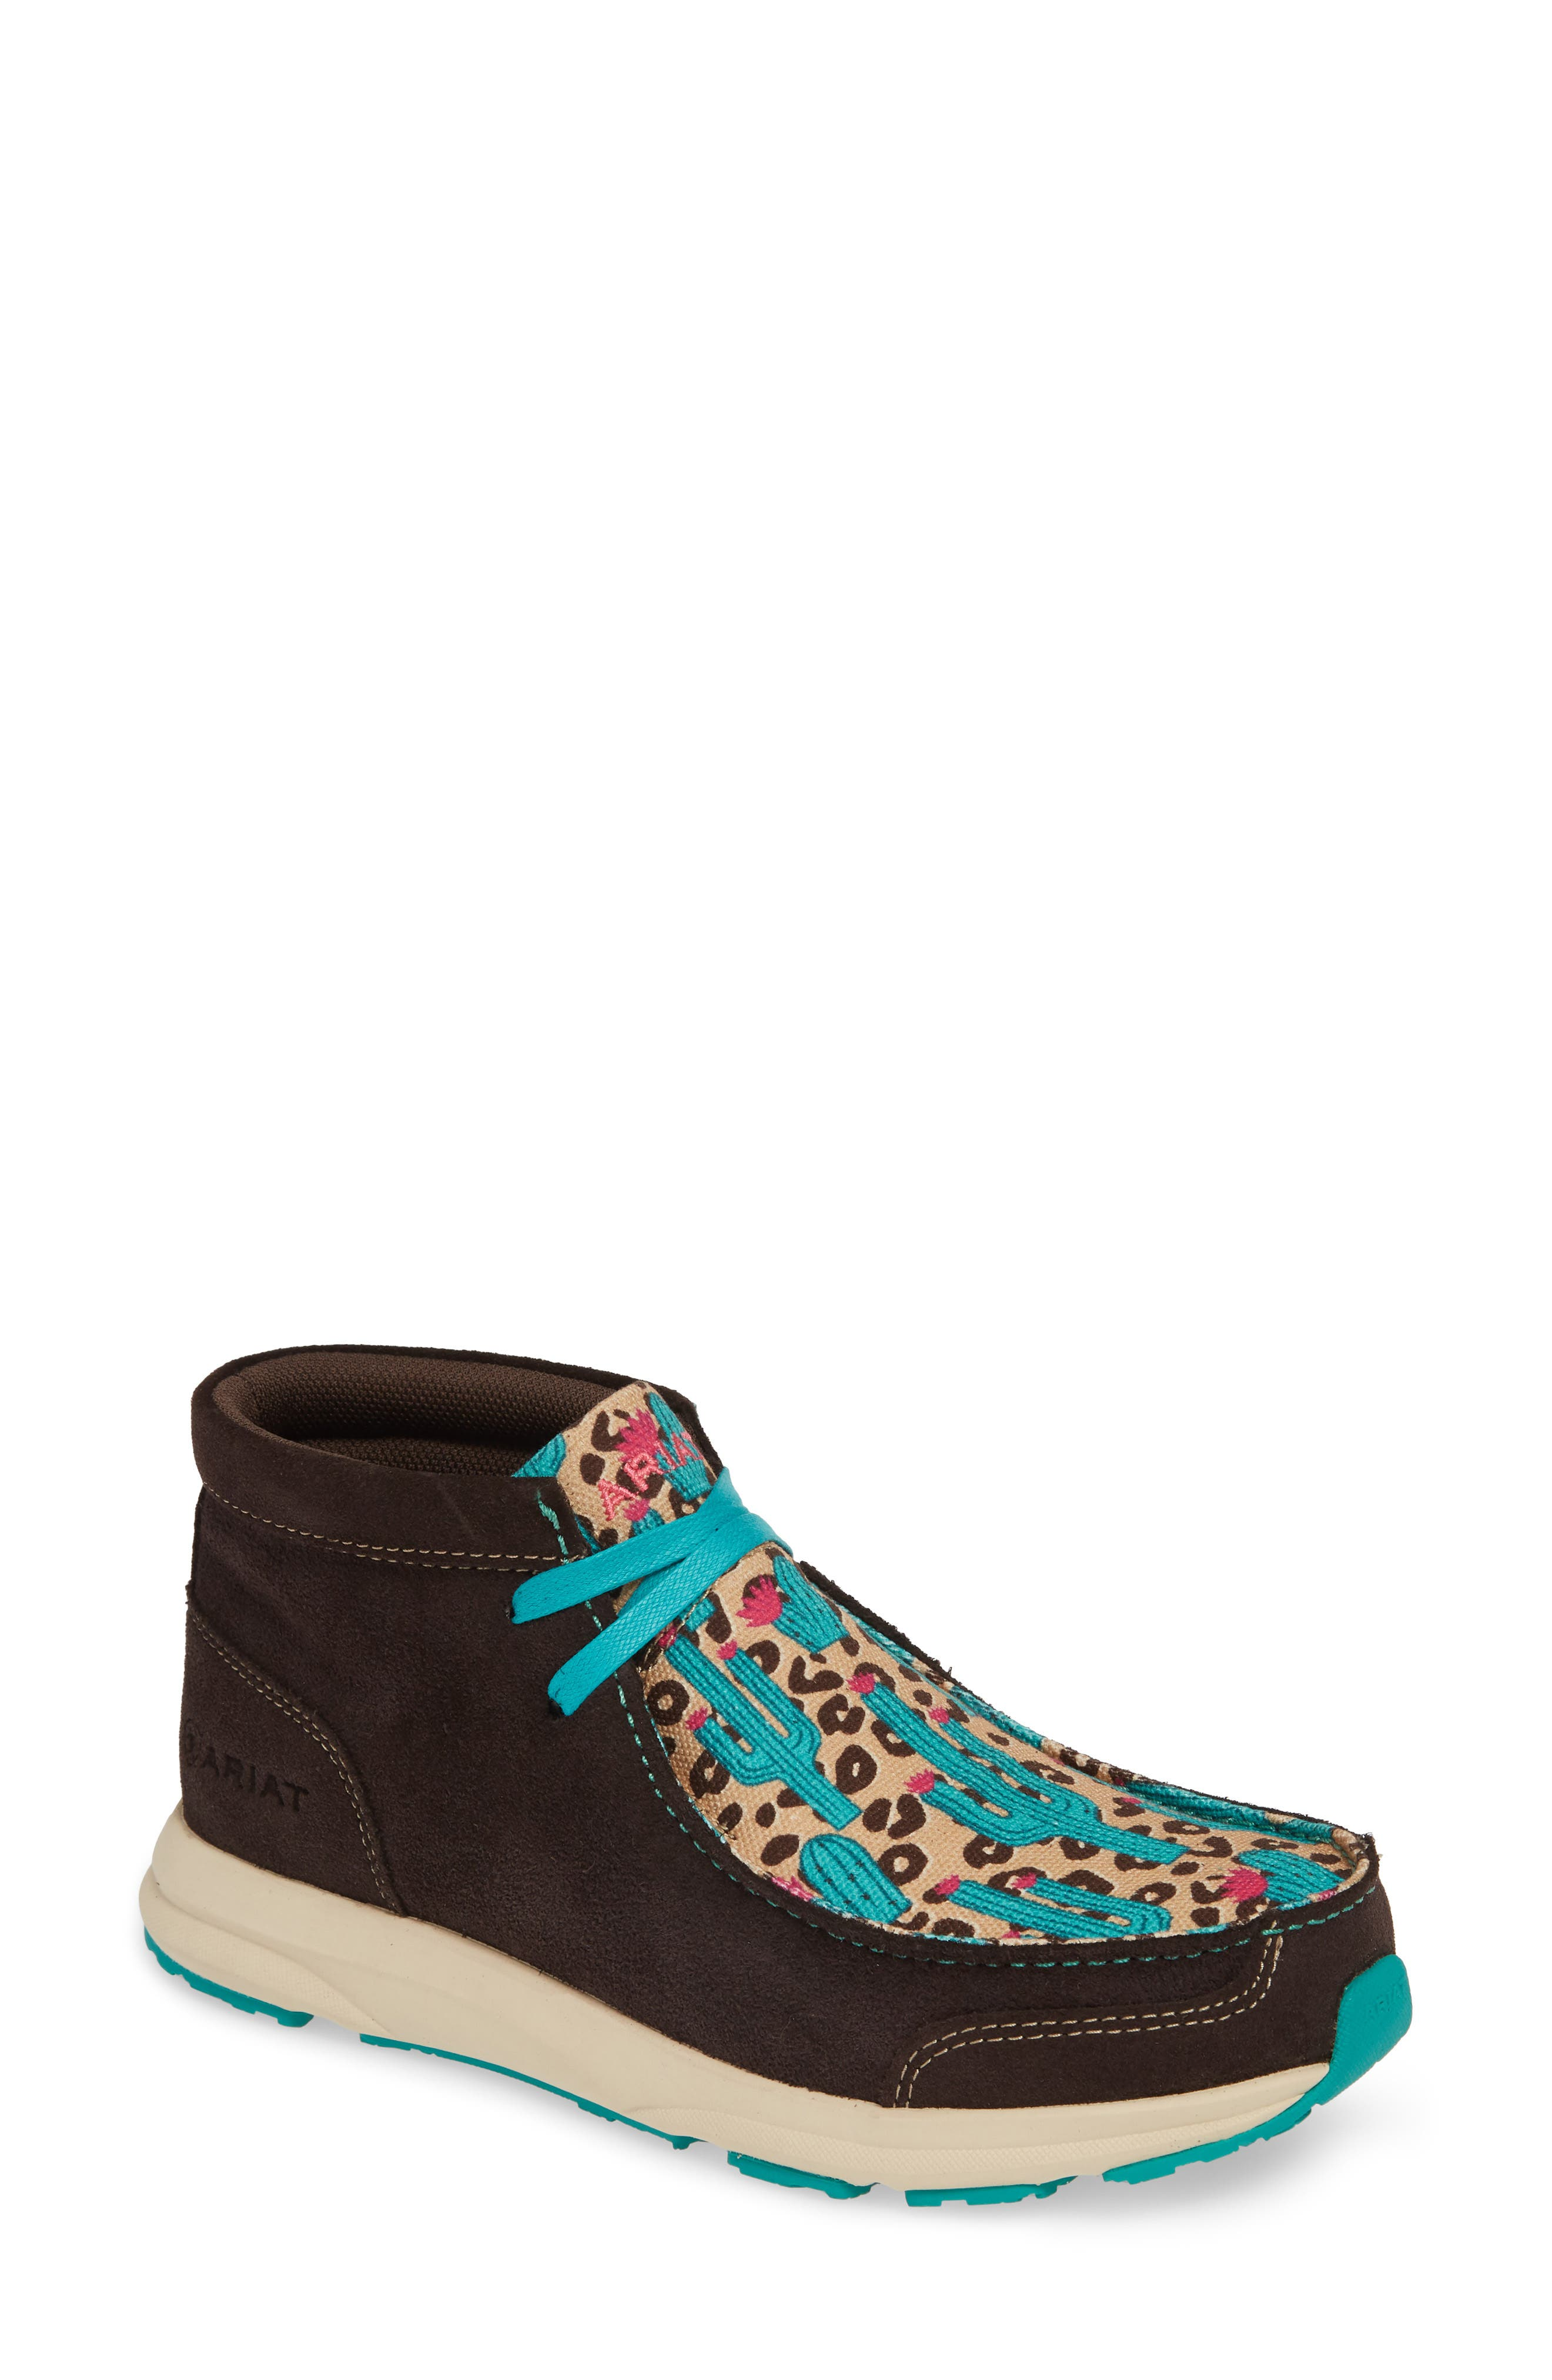 Ariat Spitfire Chukka Sneaker Bootie, Brown